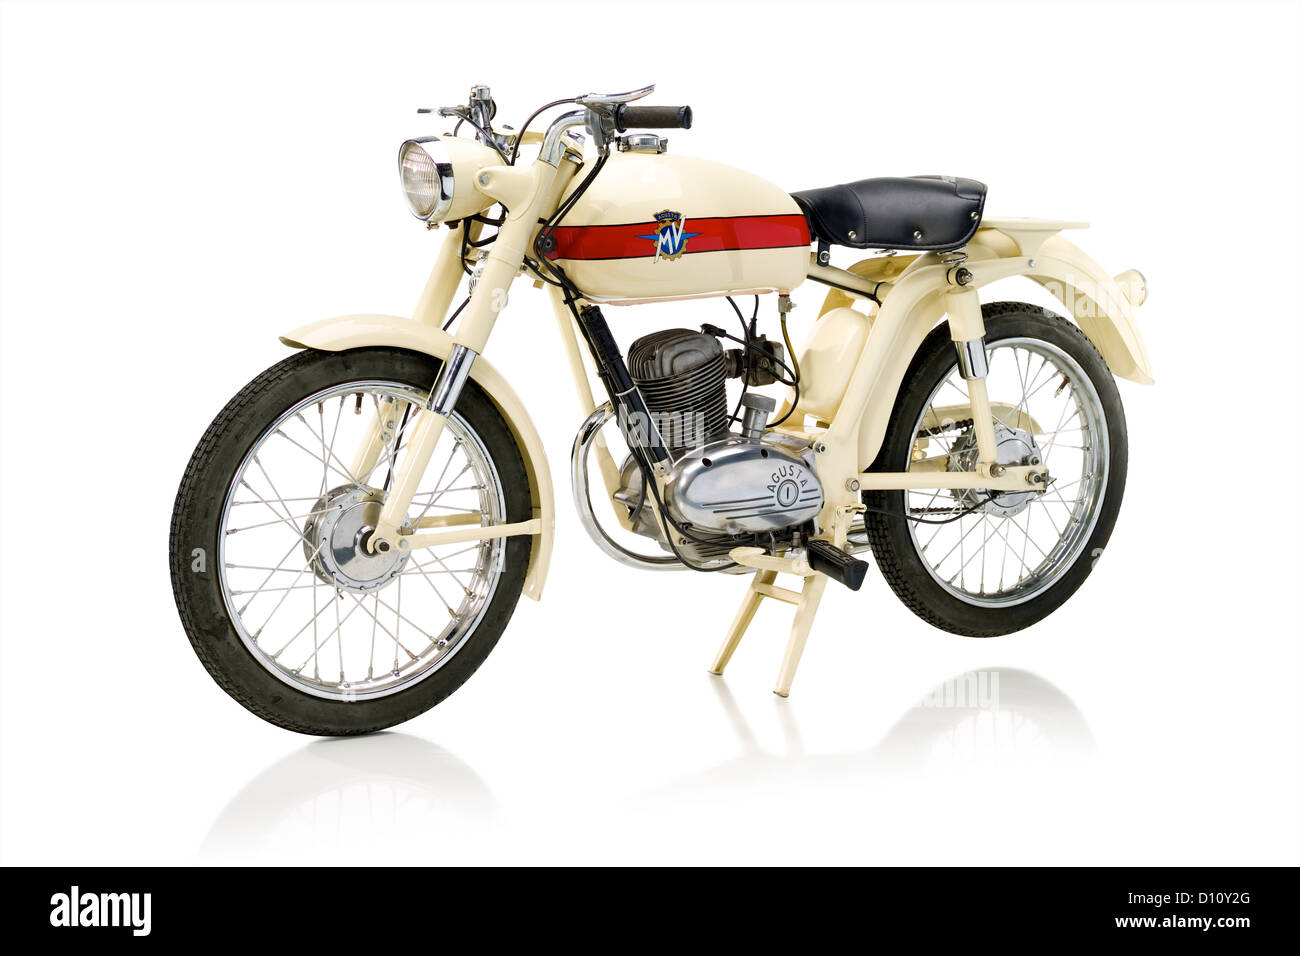 1966 MV Agusta Liberty Turismo motorcycle - Stock Image